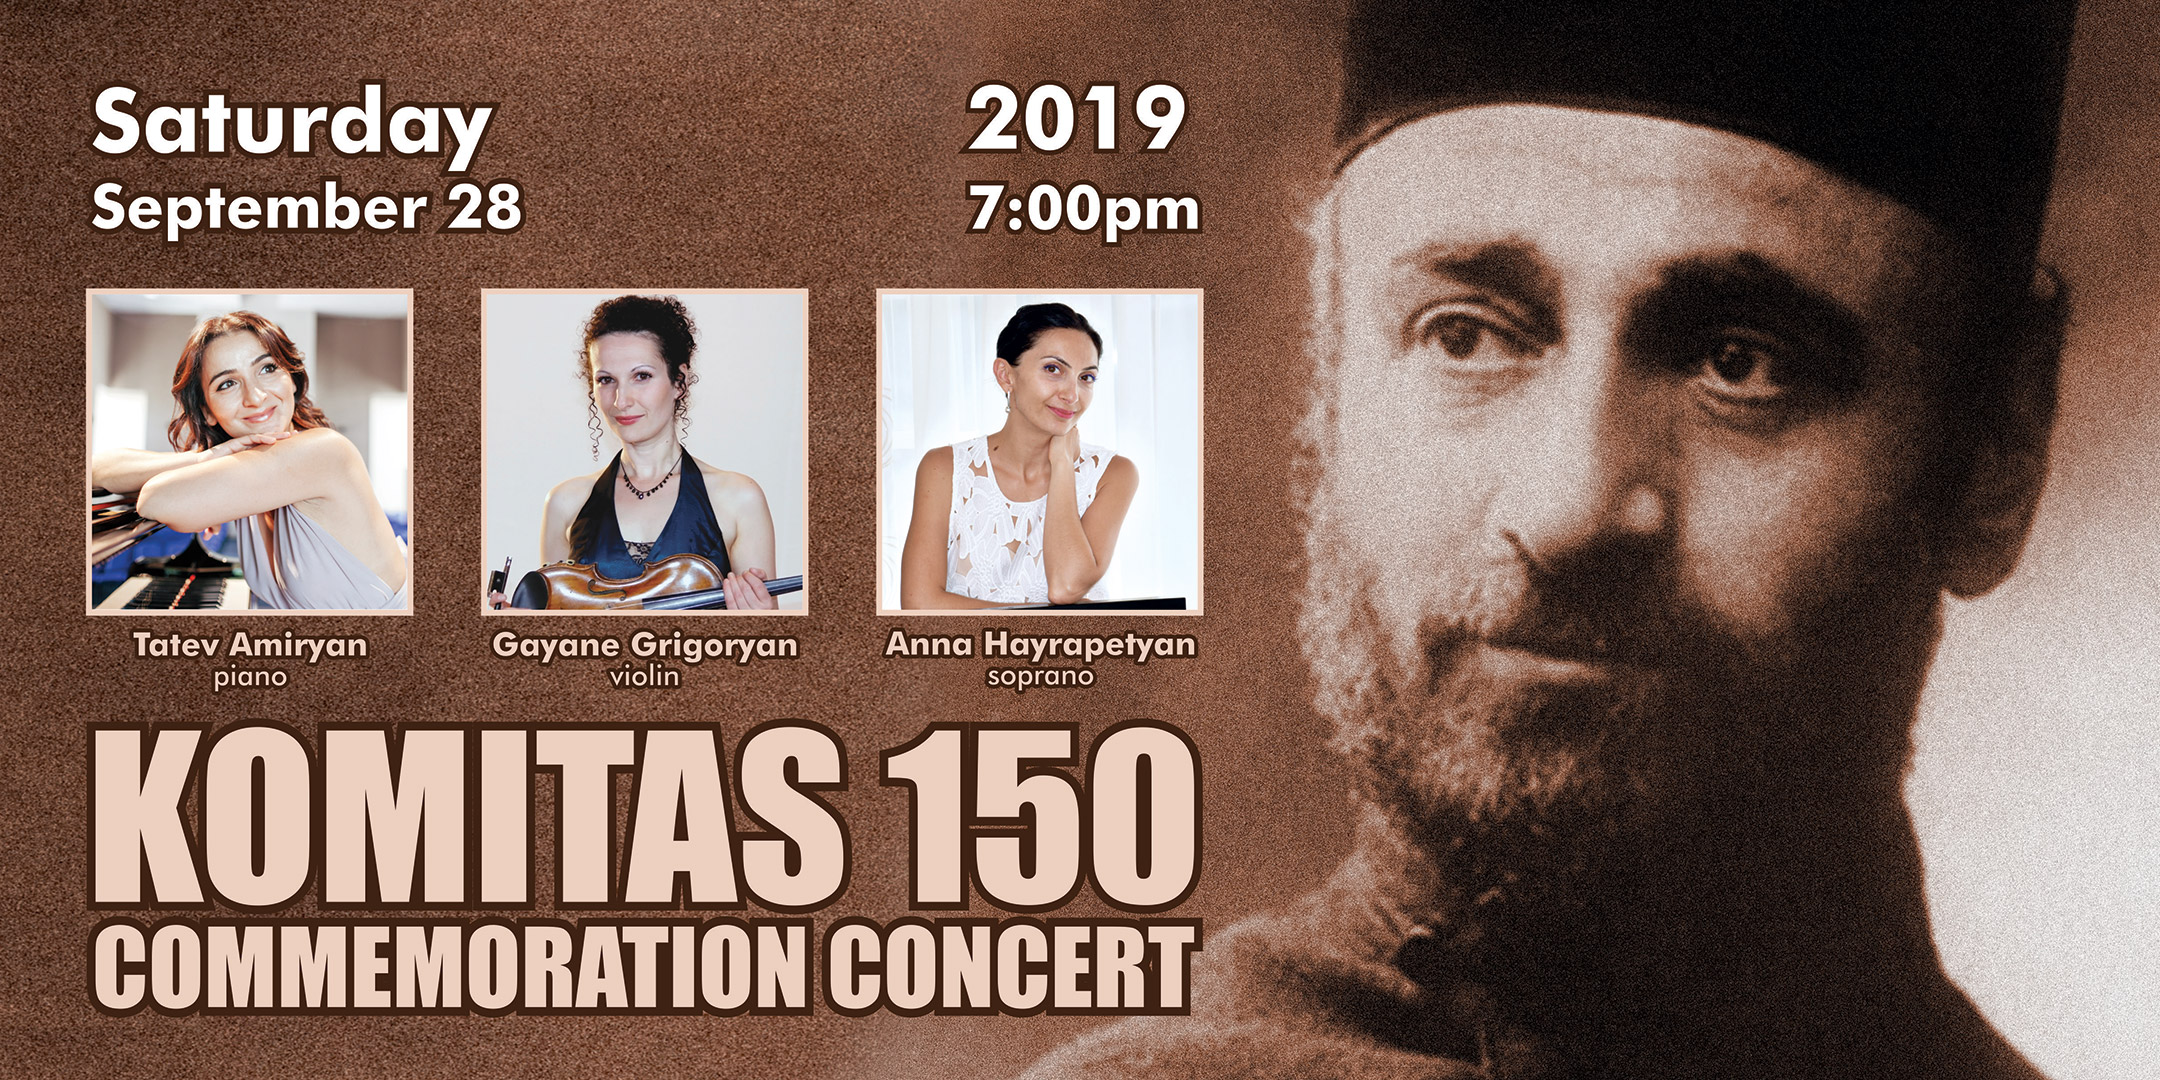 Komitas 150: Commemoration Concert